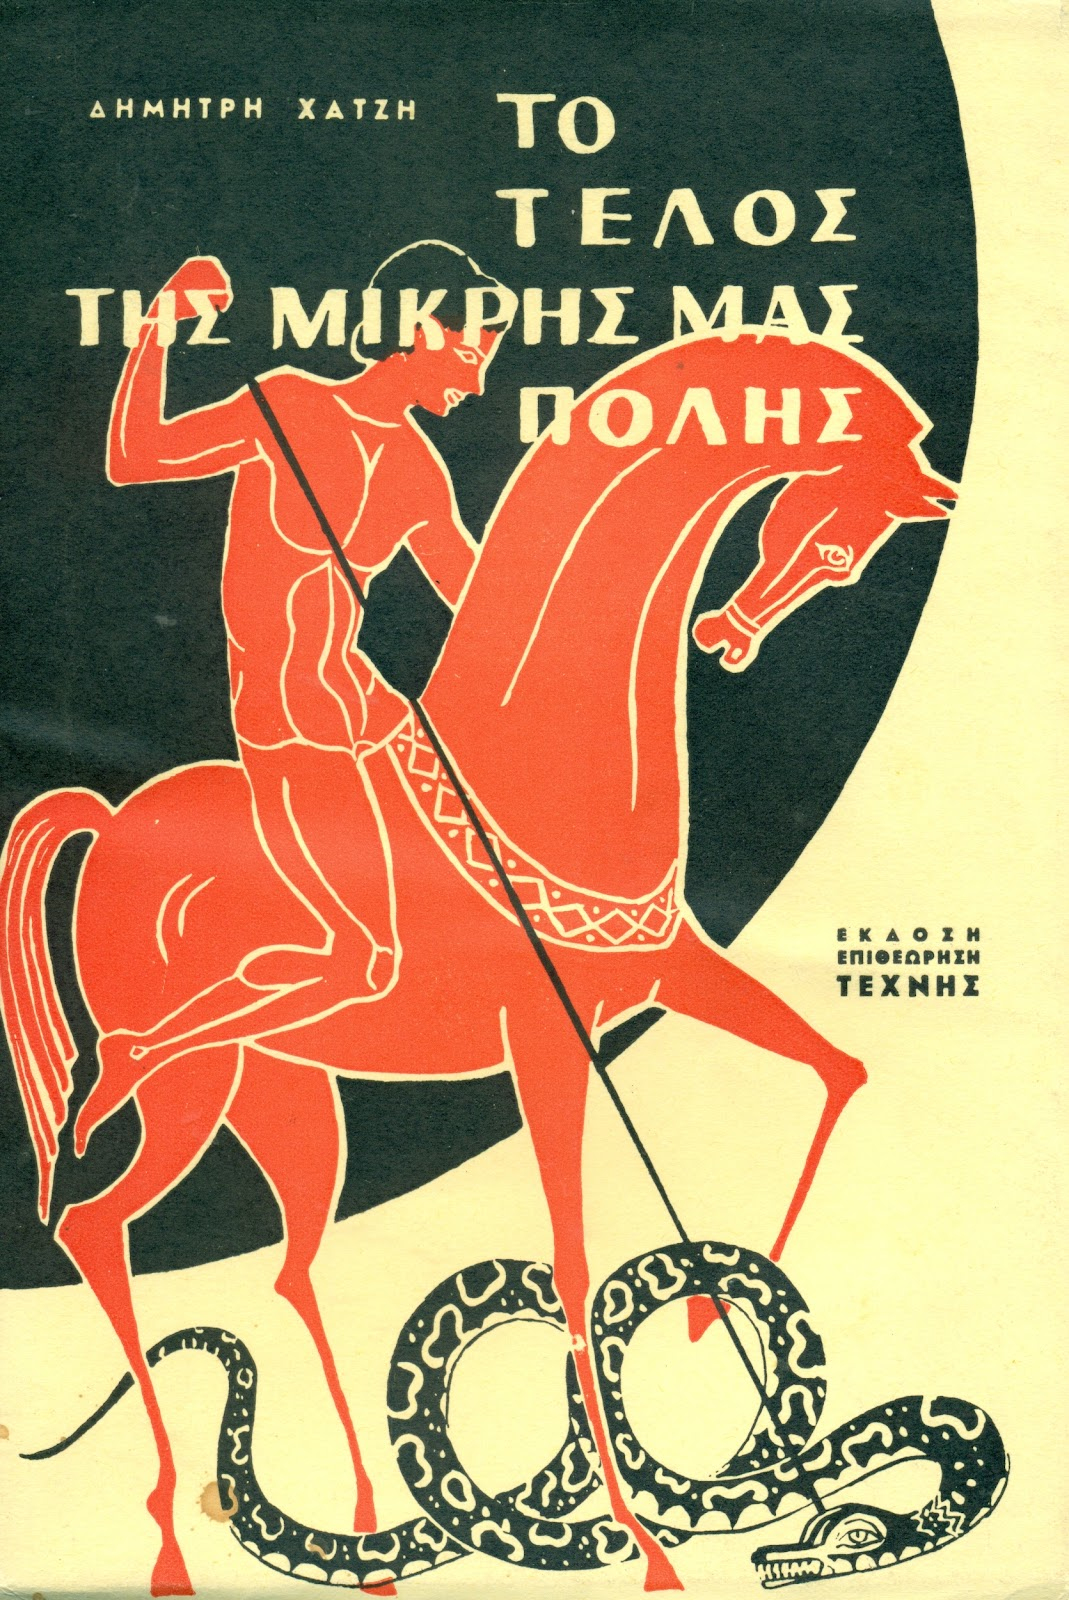 Hatzis-dimitris-telos-mikris-polis-1963.jpg